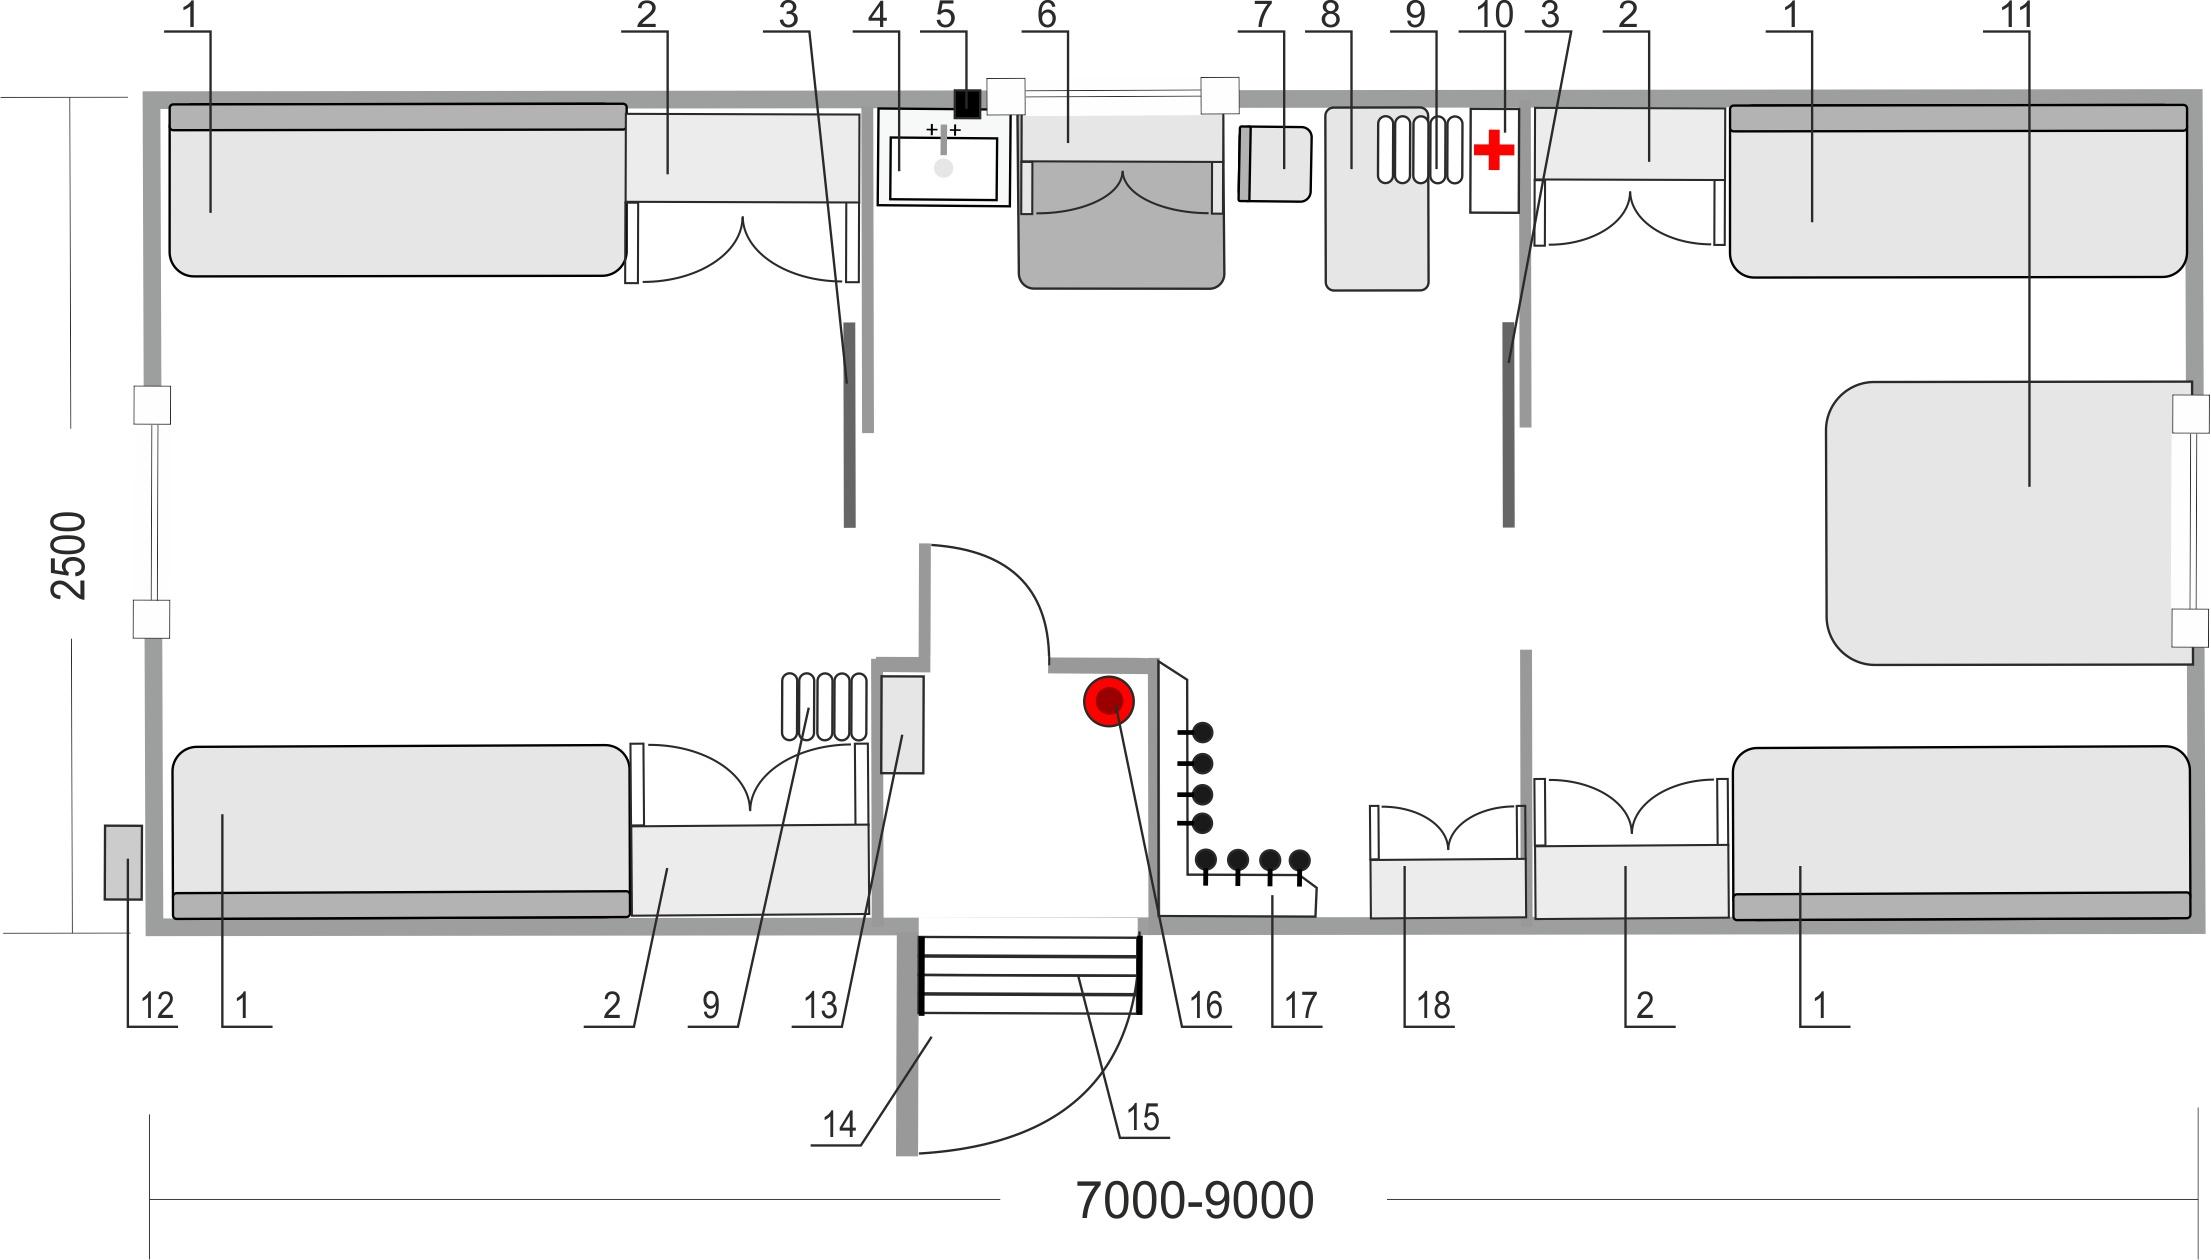 Вагон - дома на прицепах, типовая планировка фургона